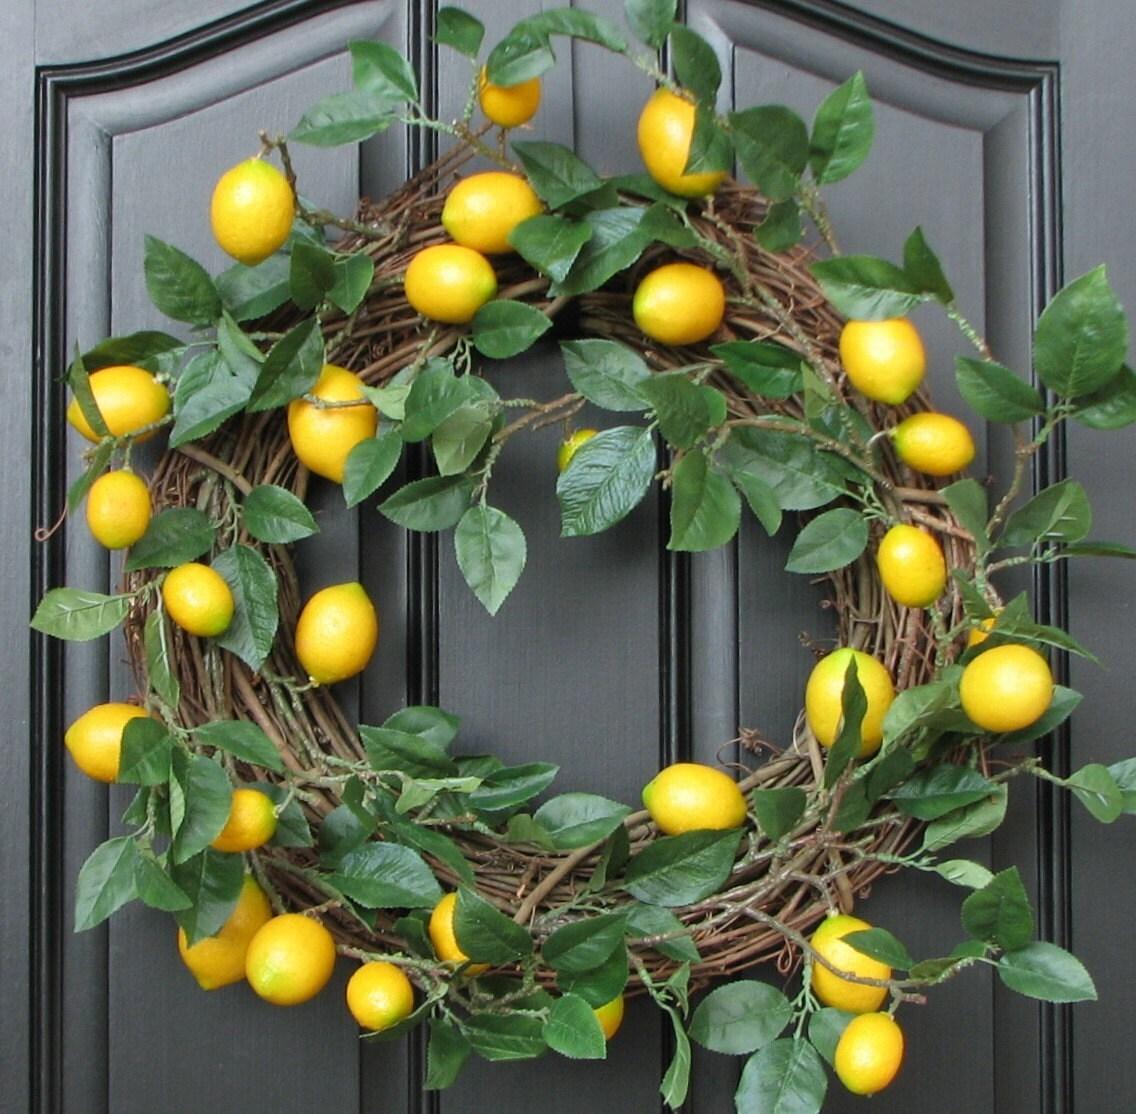 Lemon Wreath